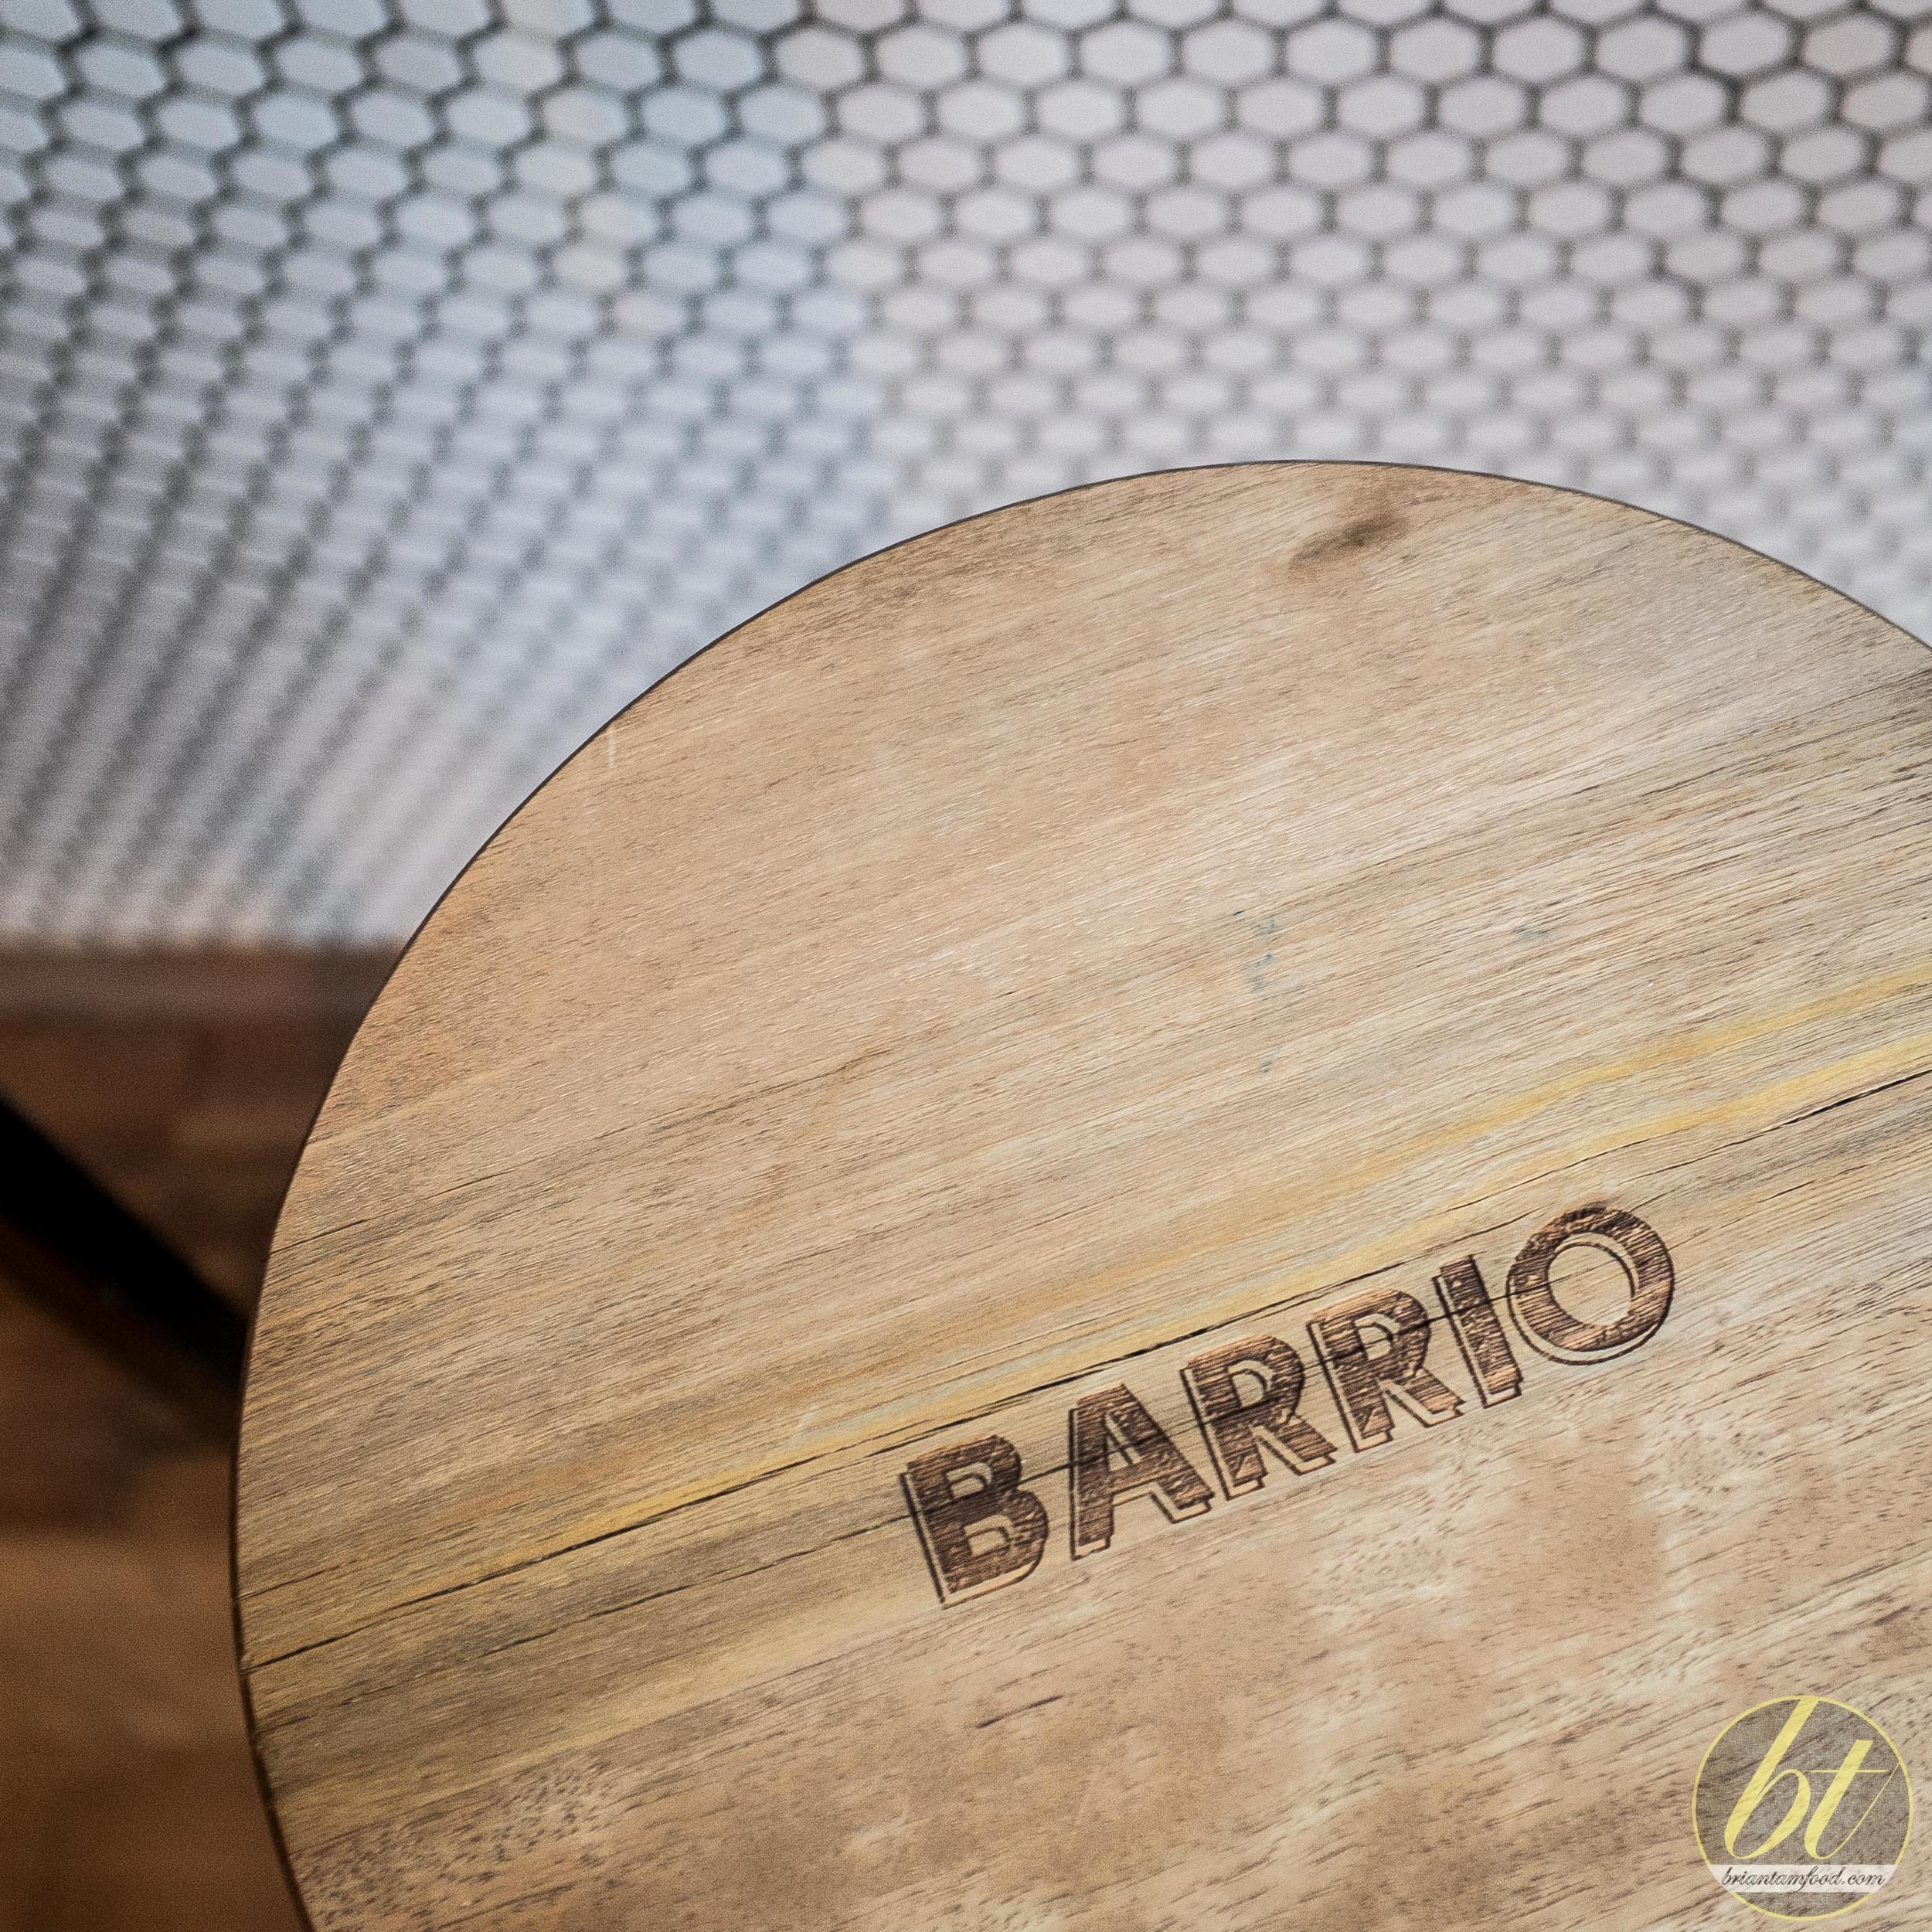 Barrio Collective Coffee Braddon 1